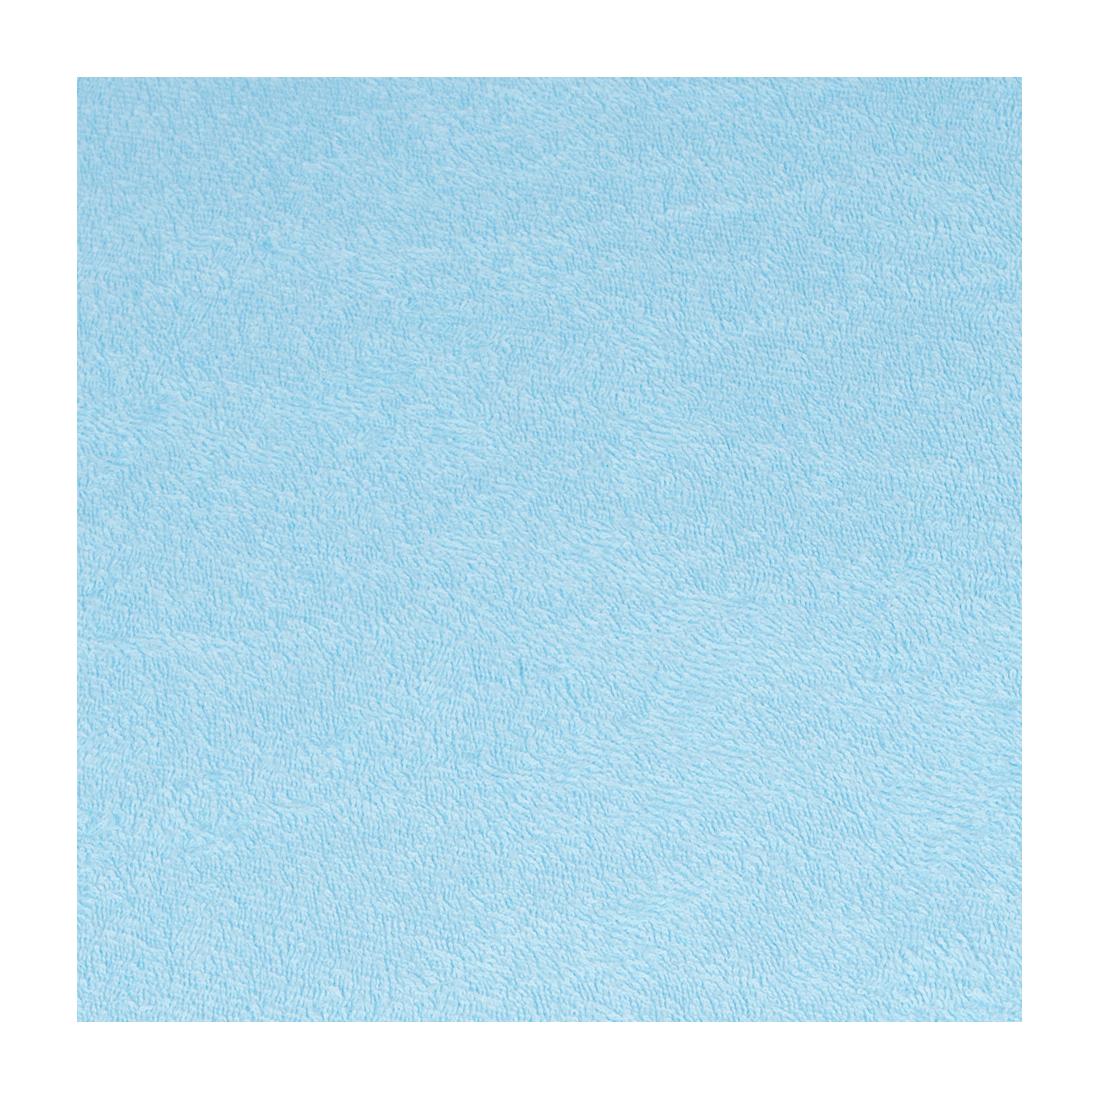 NP froté Polštář FR PUR 40x45x14 m, modrá